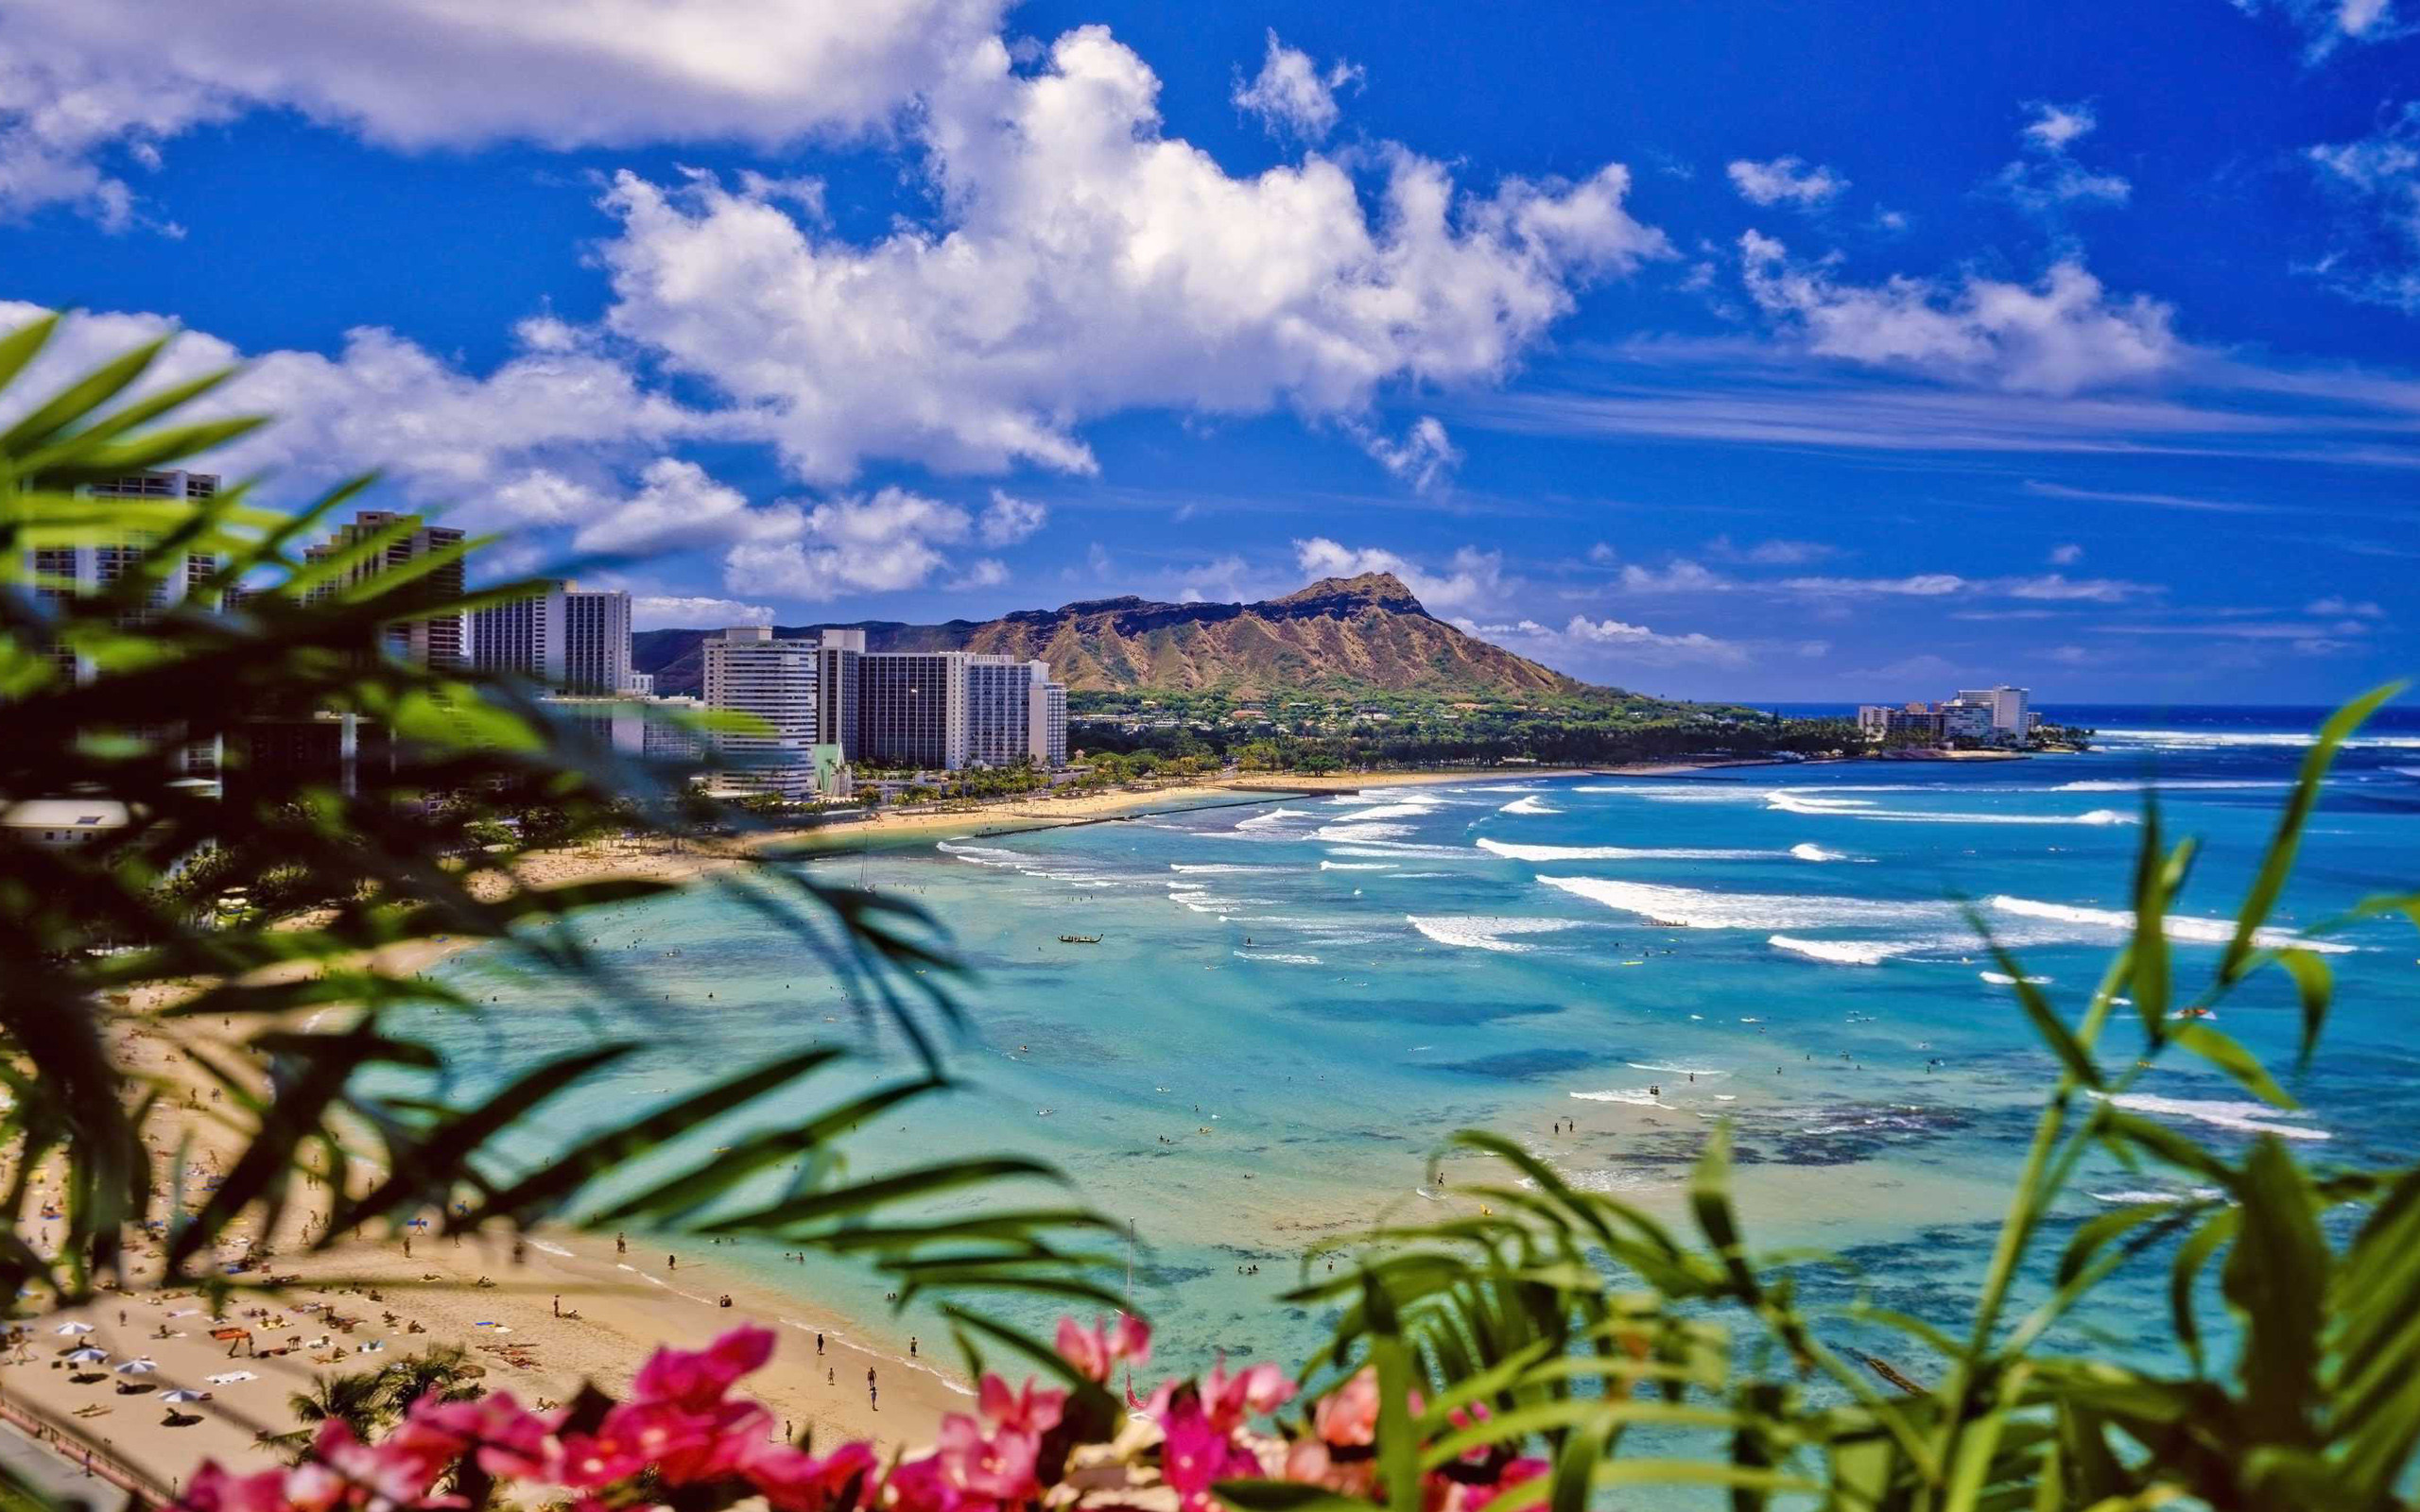 Hawaii Wallpaper (69+ pictures)